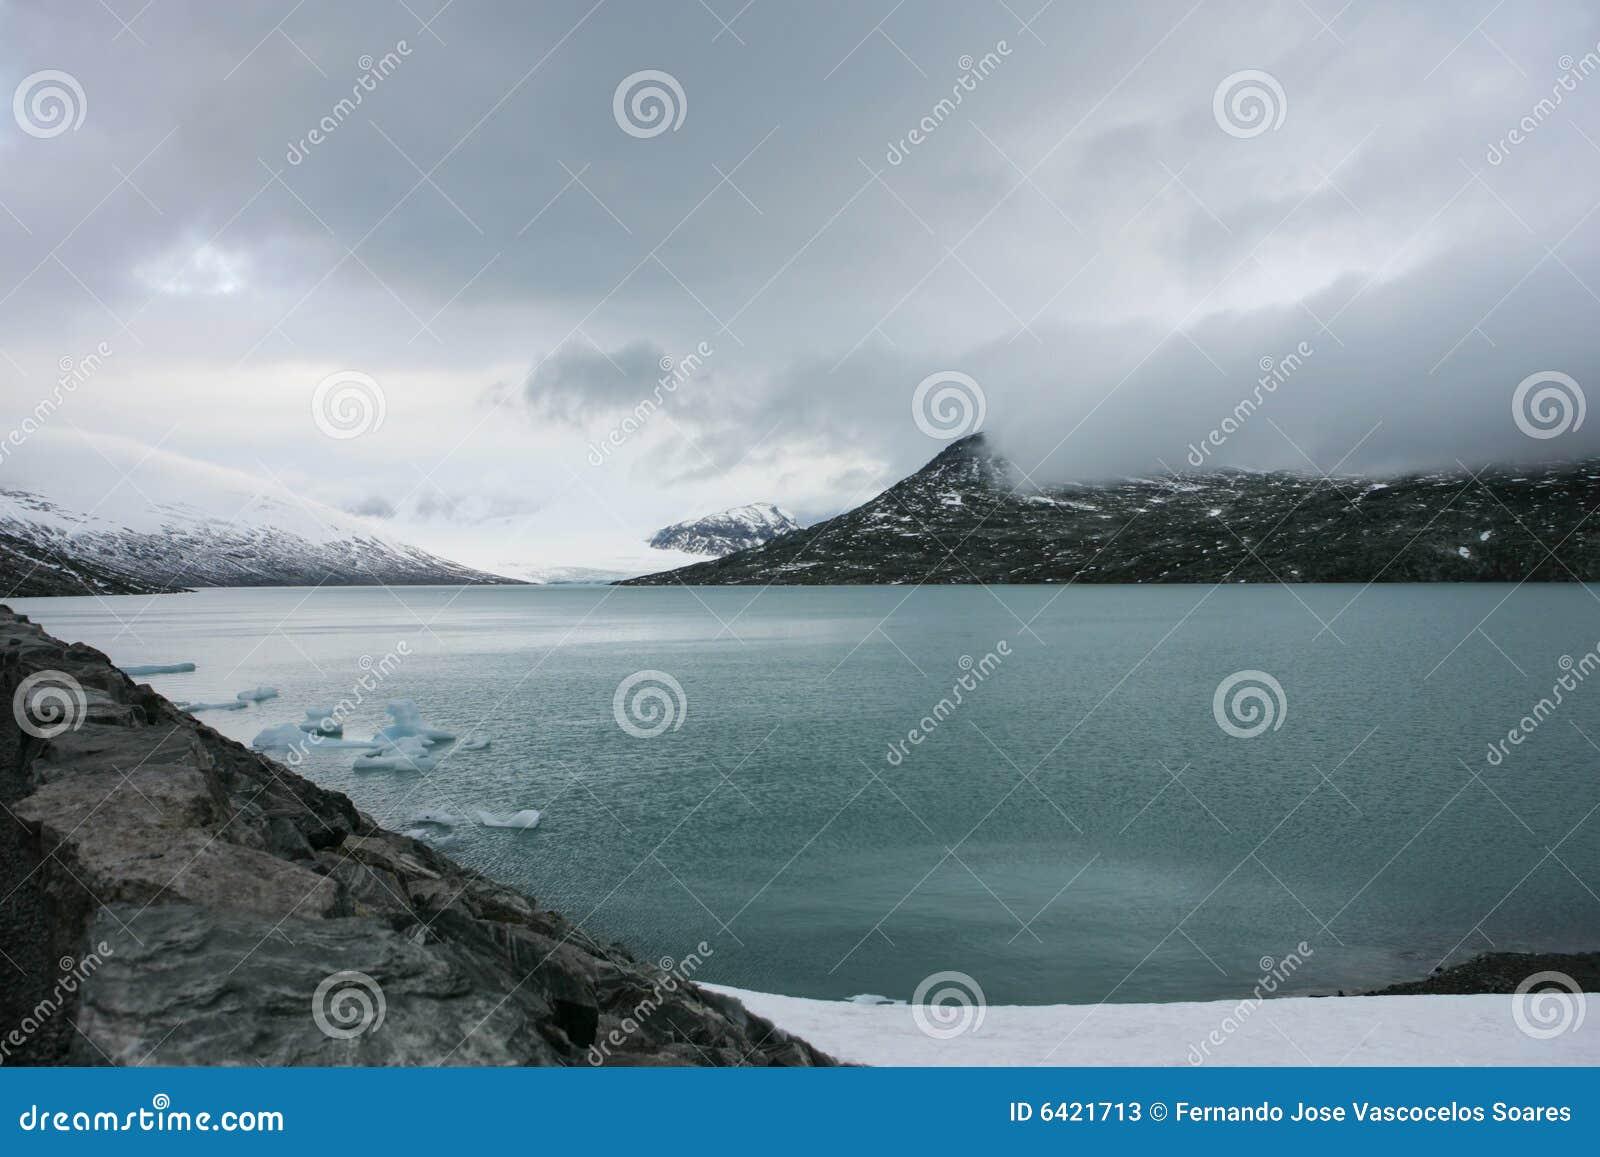 Le glacier jostedalsbreen